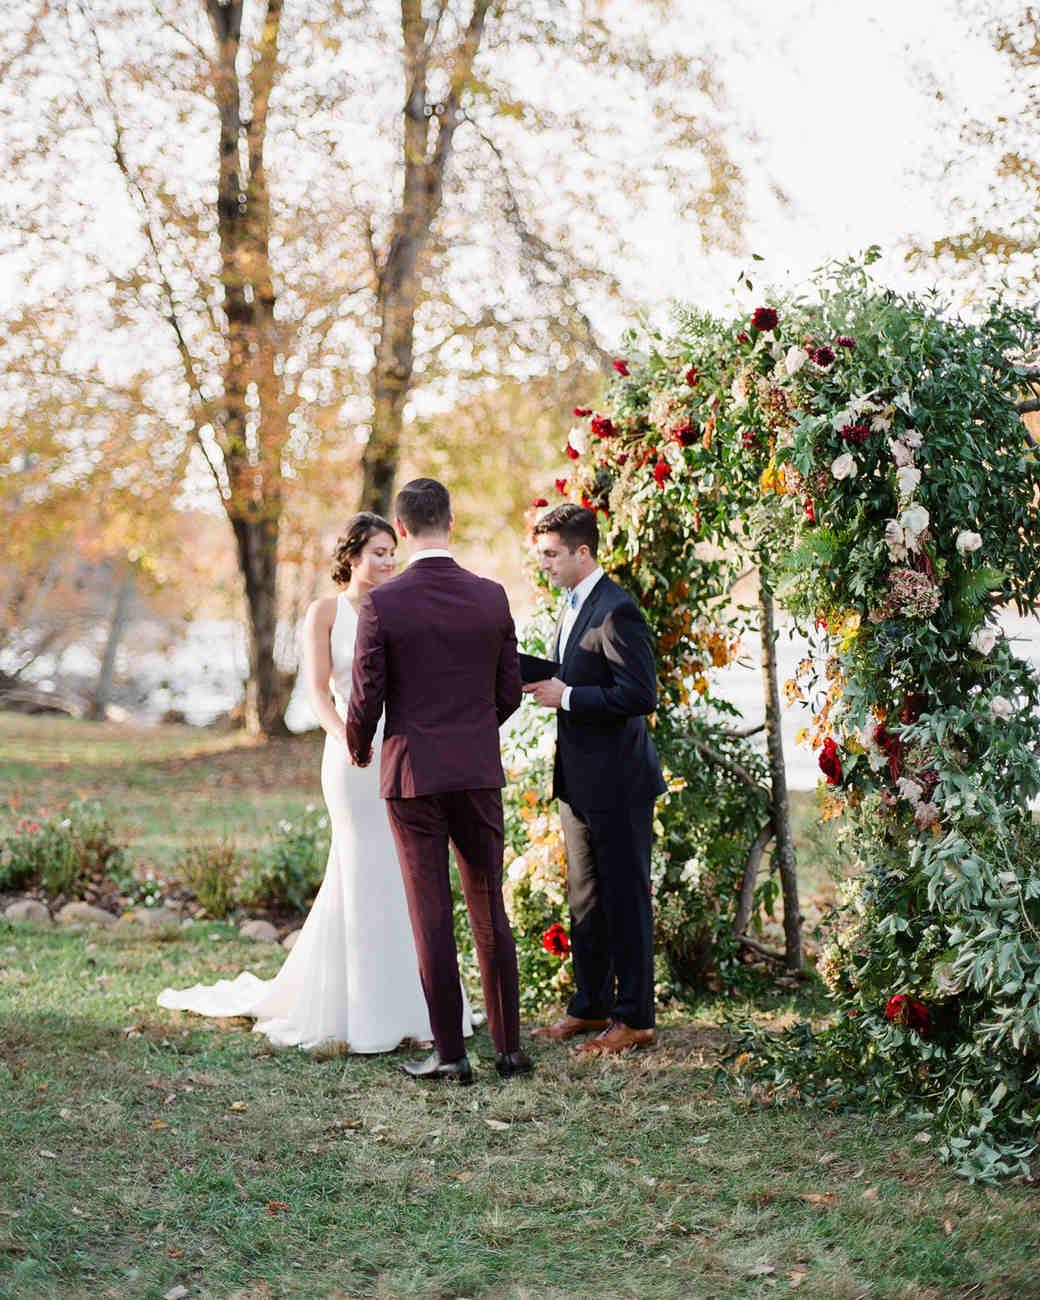 floral arch wedding ceremony backdrop by bride and groom